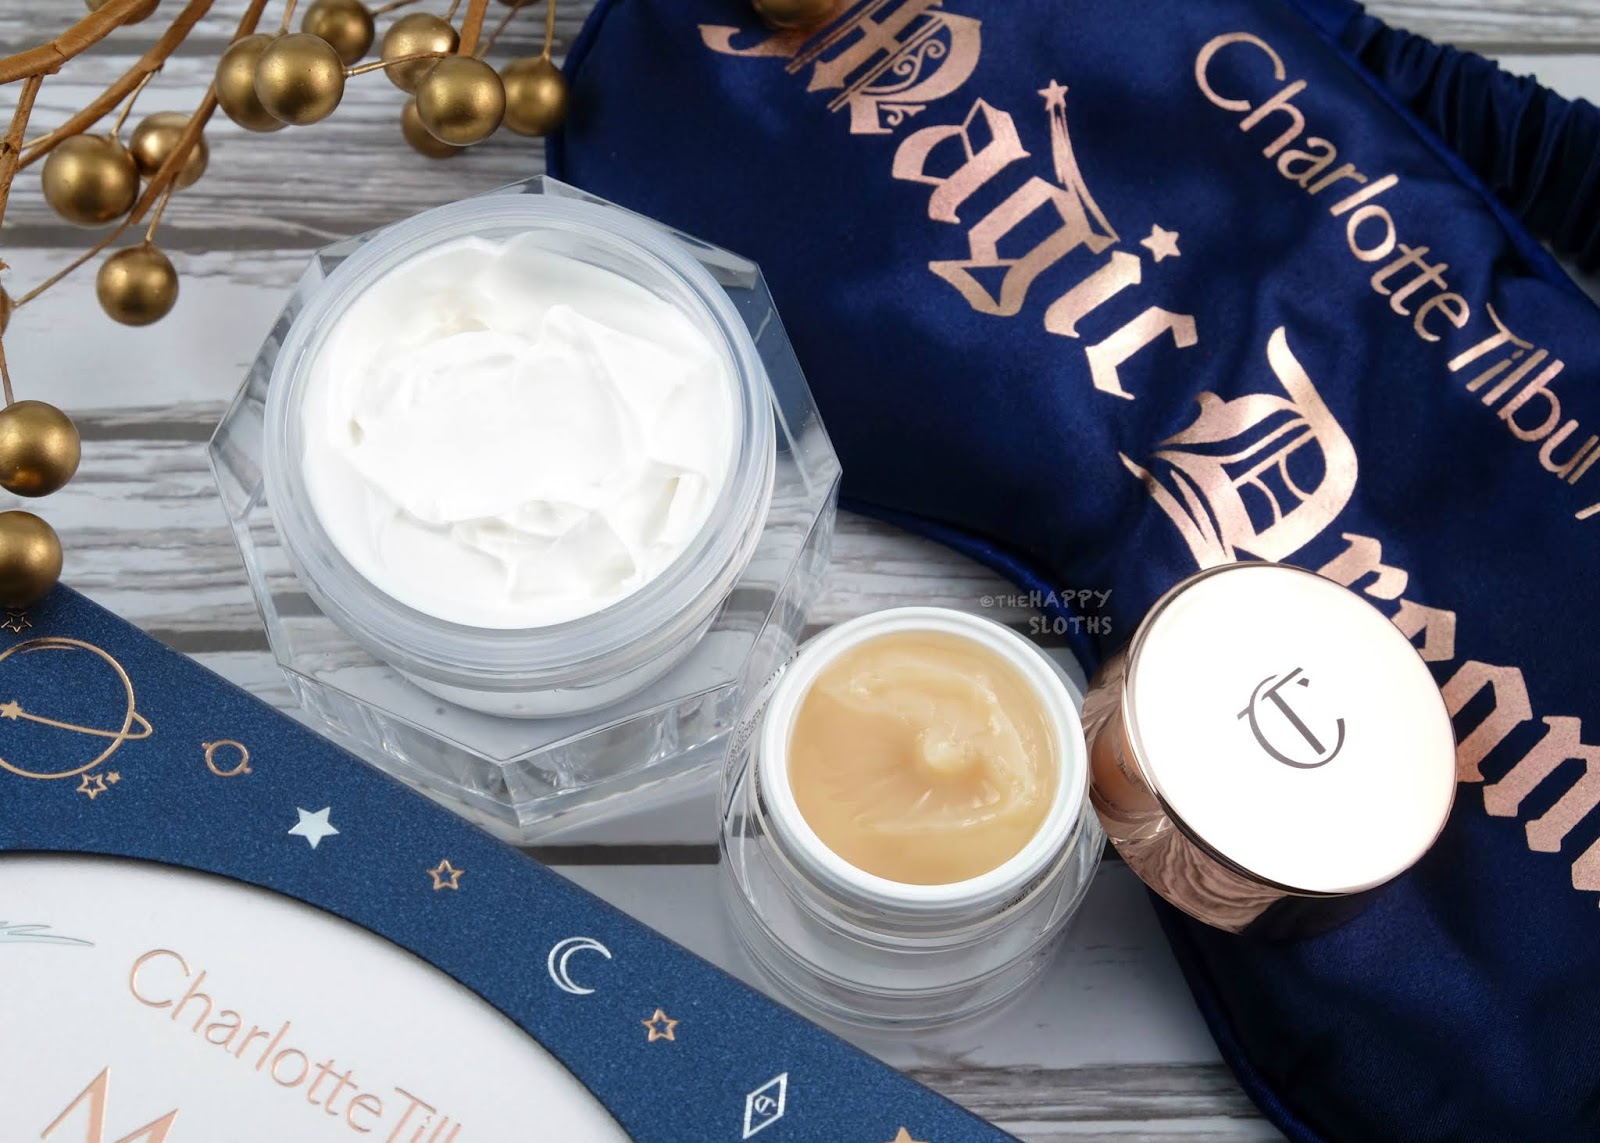 Charlotte Tilbury | Magic Dream Skincare Kit: Review